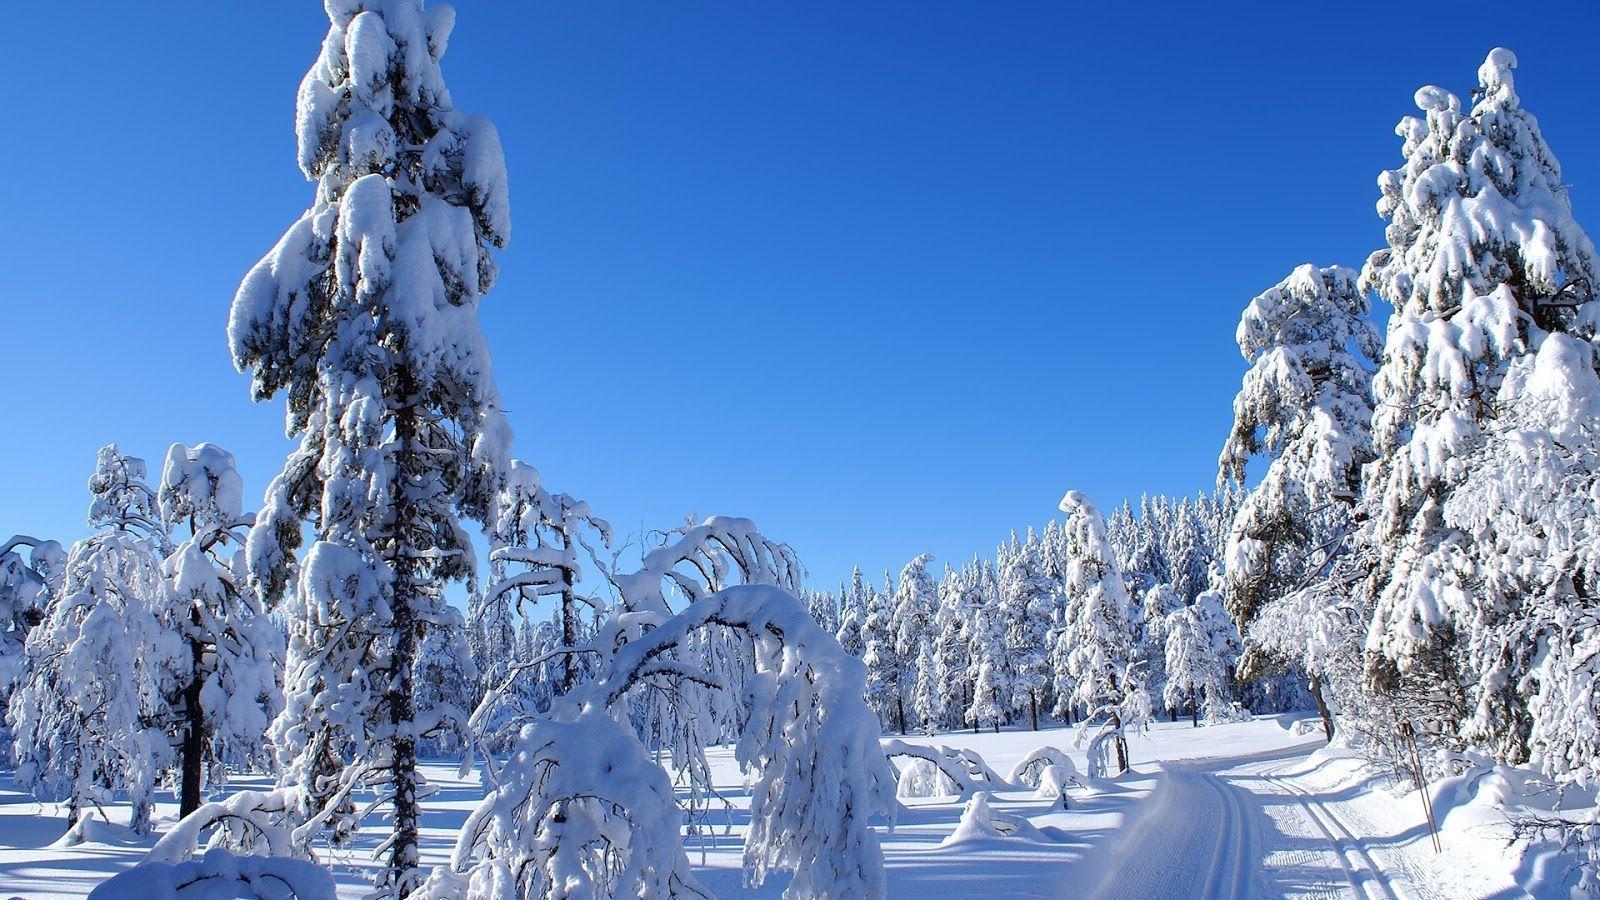 scenic winter beautiful wallpapers - photo #22